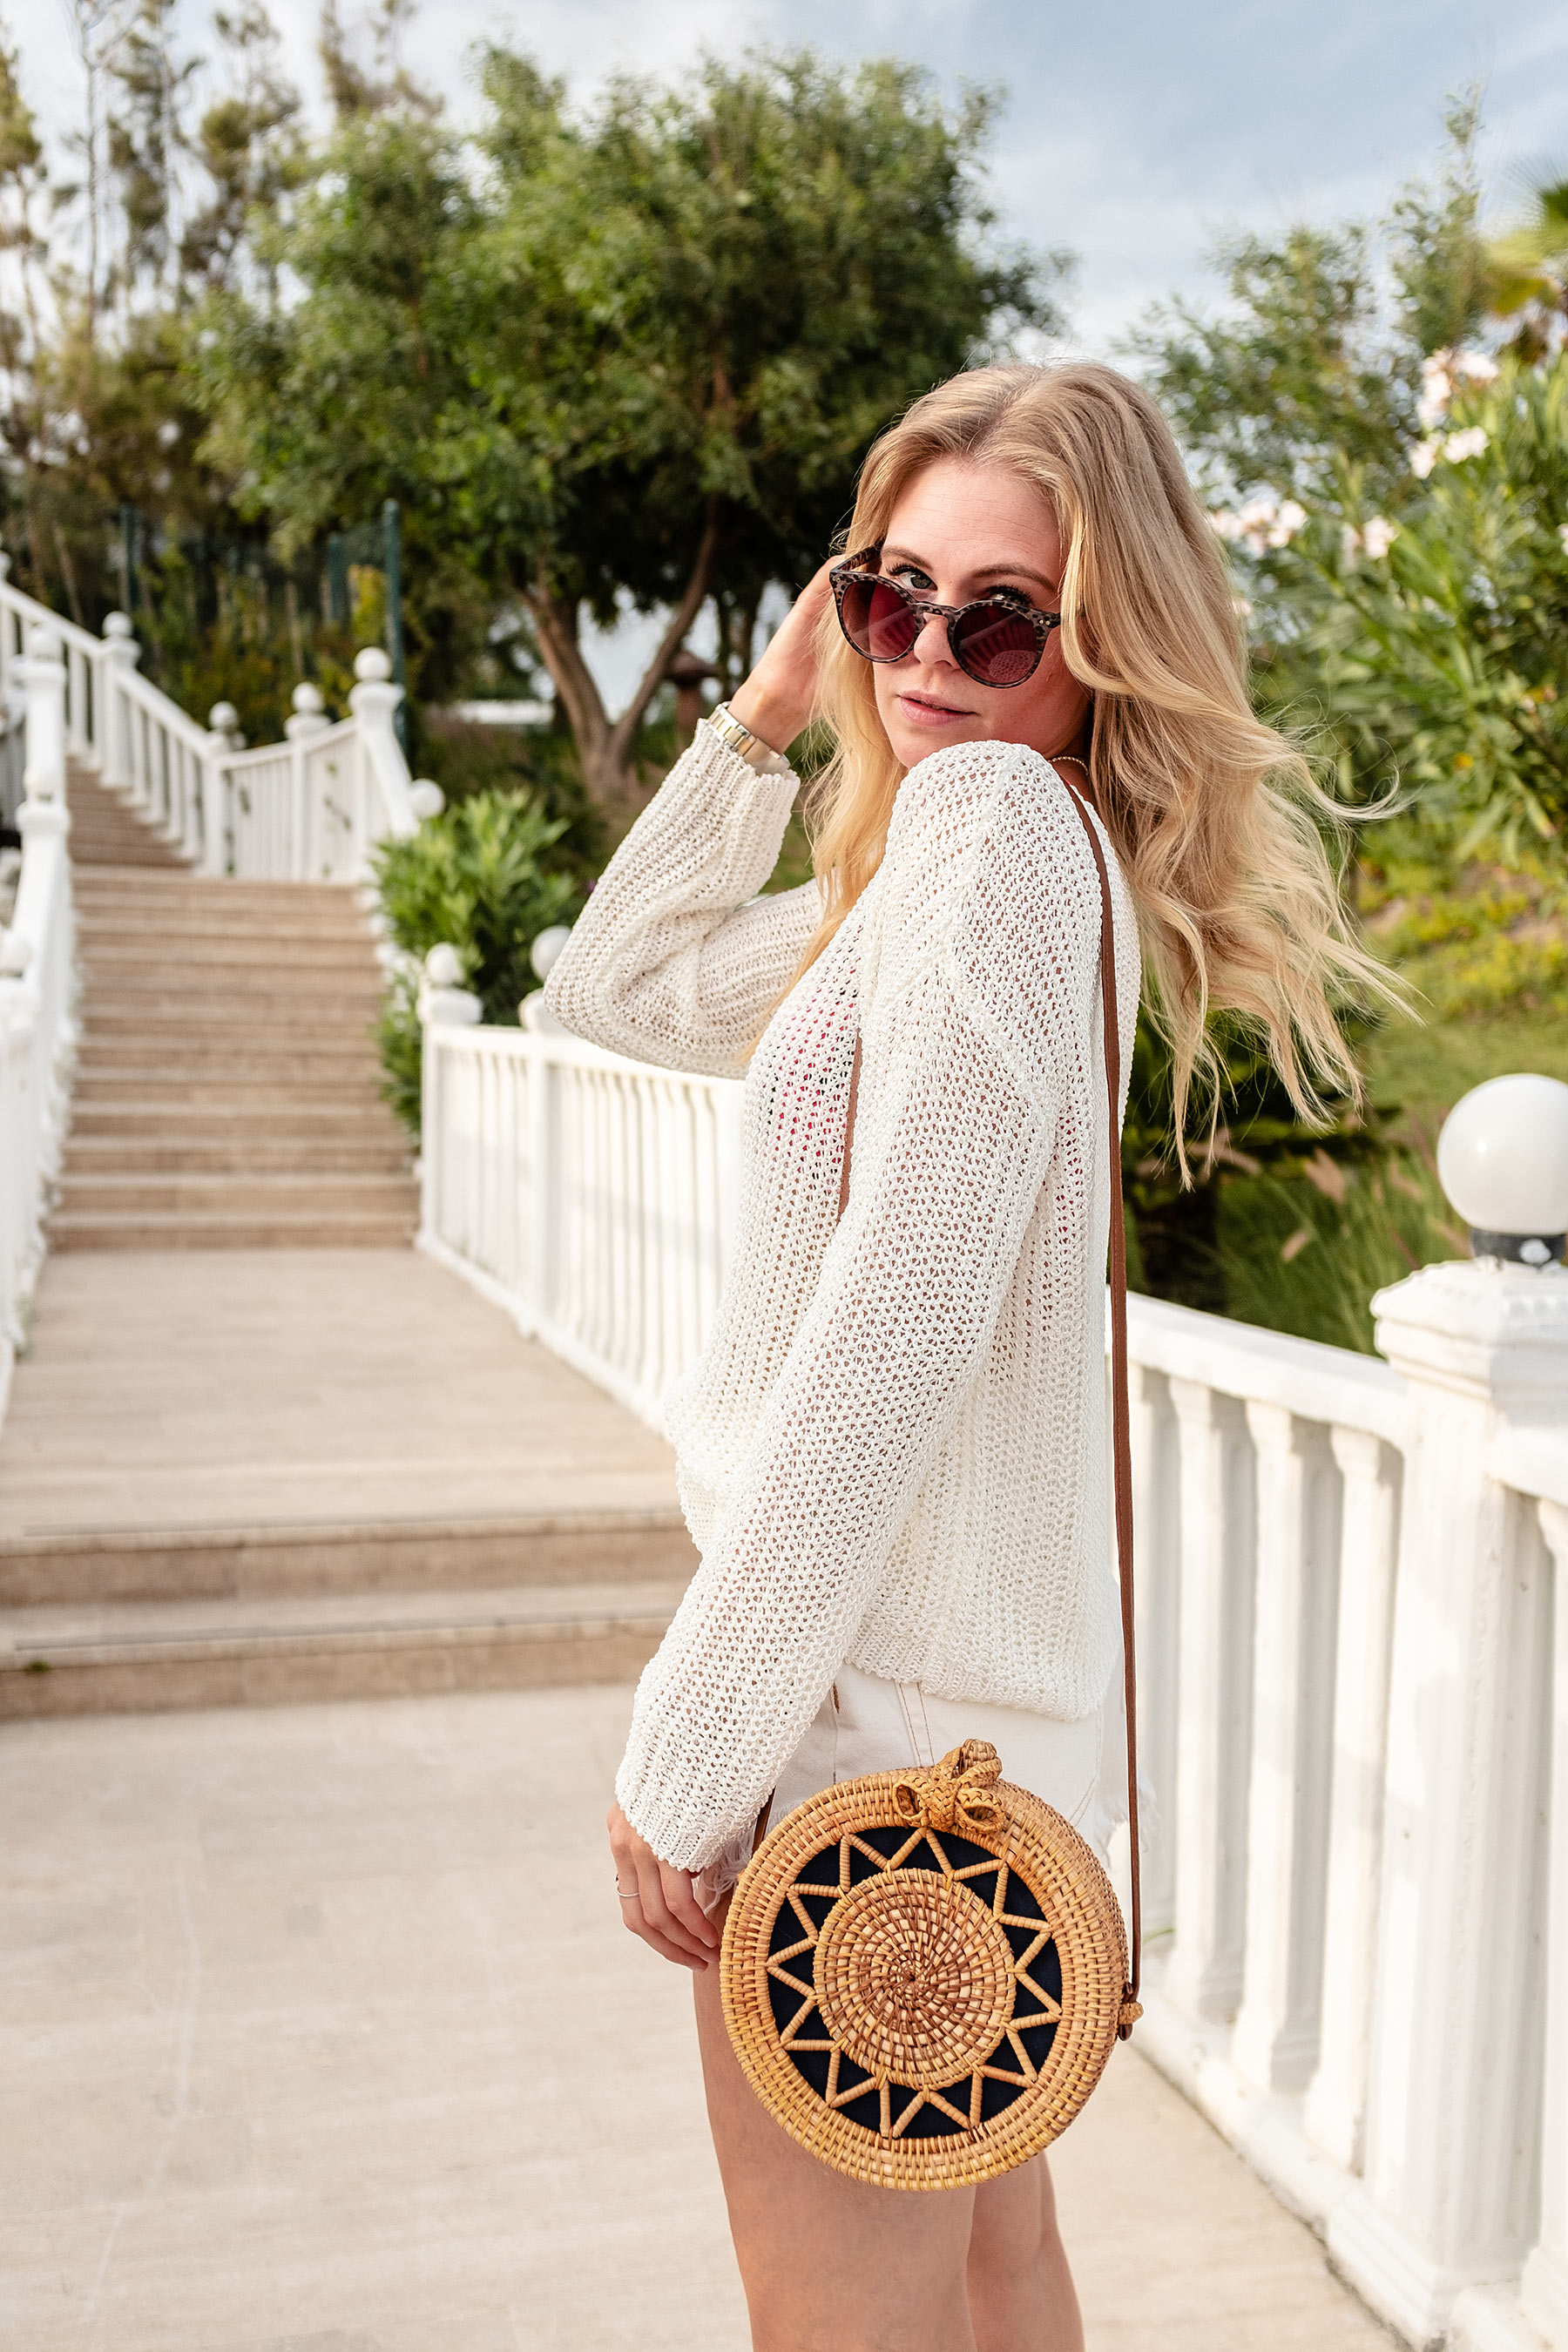 korbtasche deichmann fashion blogger outfit sunnyinga